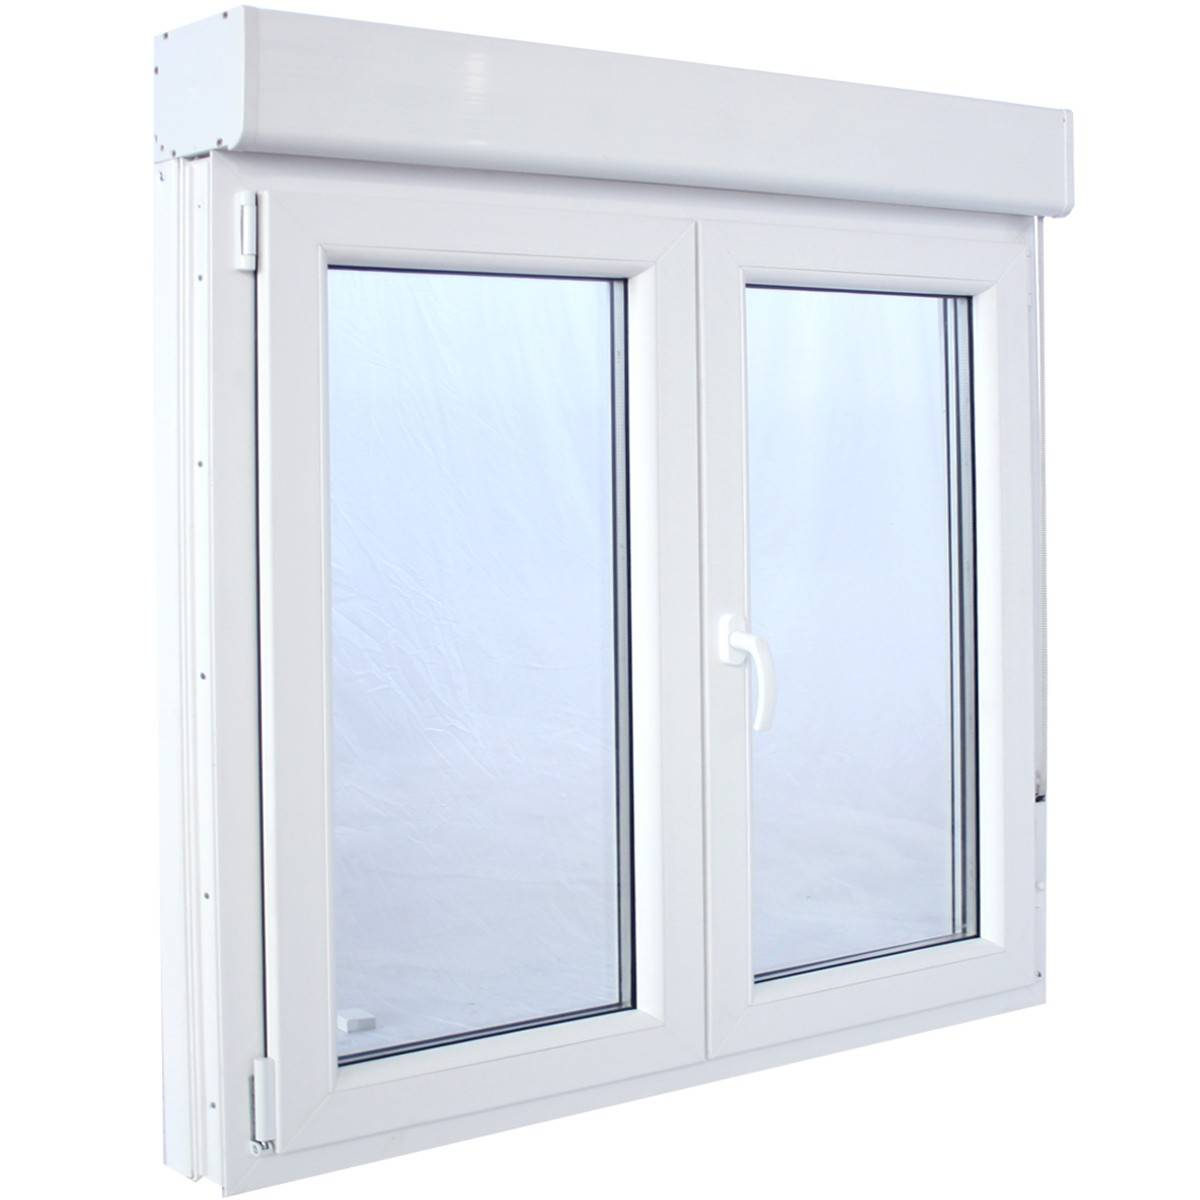 ventana pvc blanco persiana y mosquitera